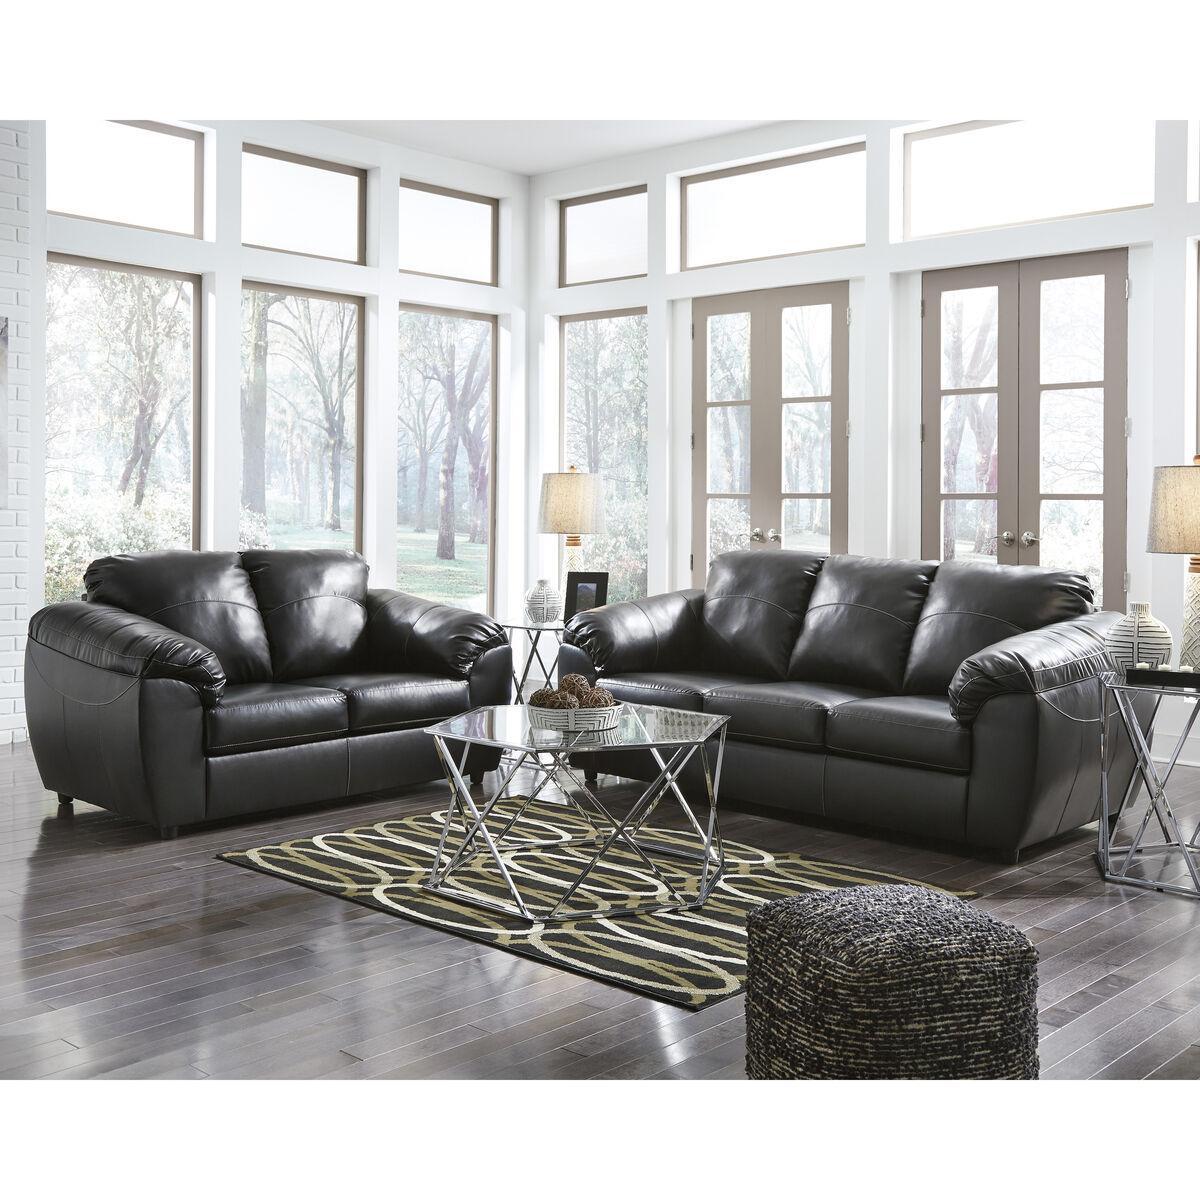 Black Leather Living Set FSD-6529SET-BLK-GG   Bizchair.com